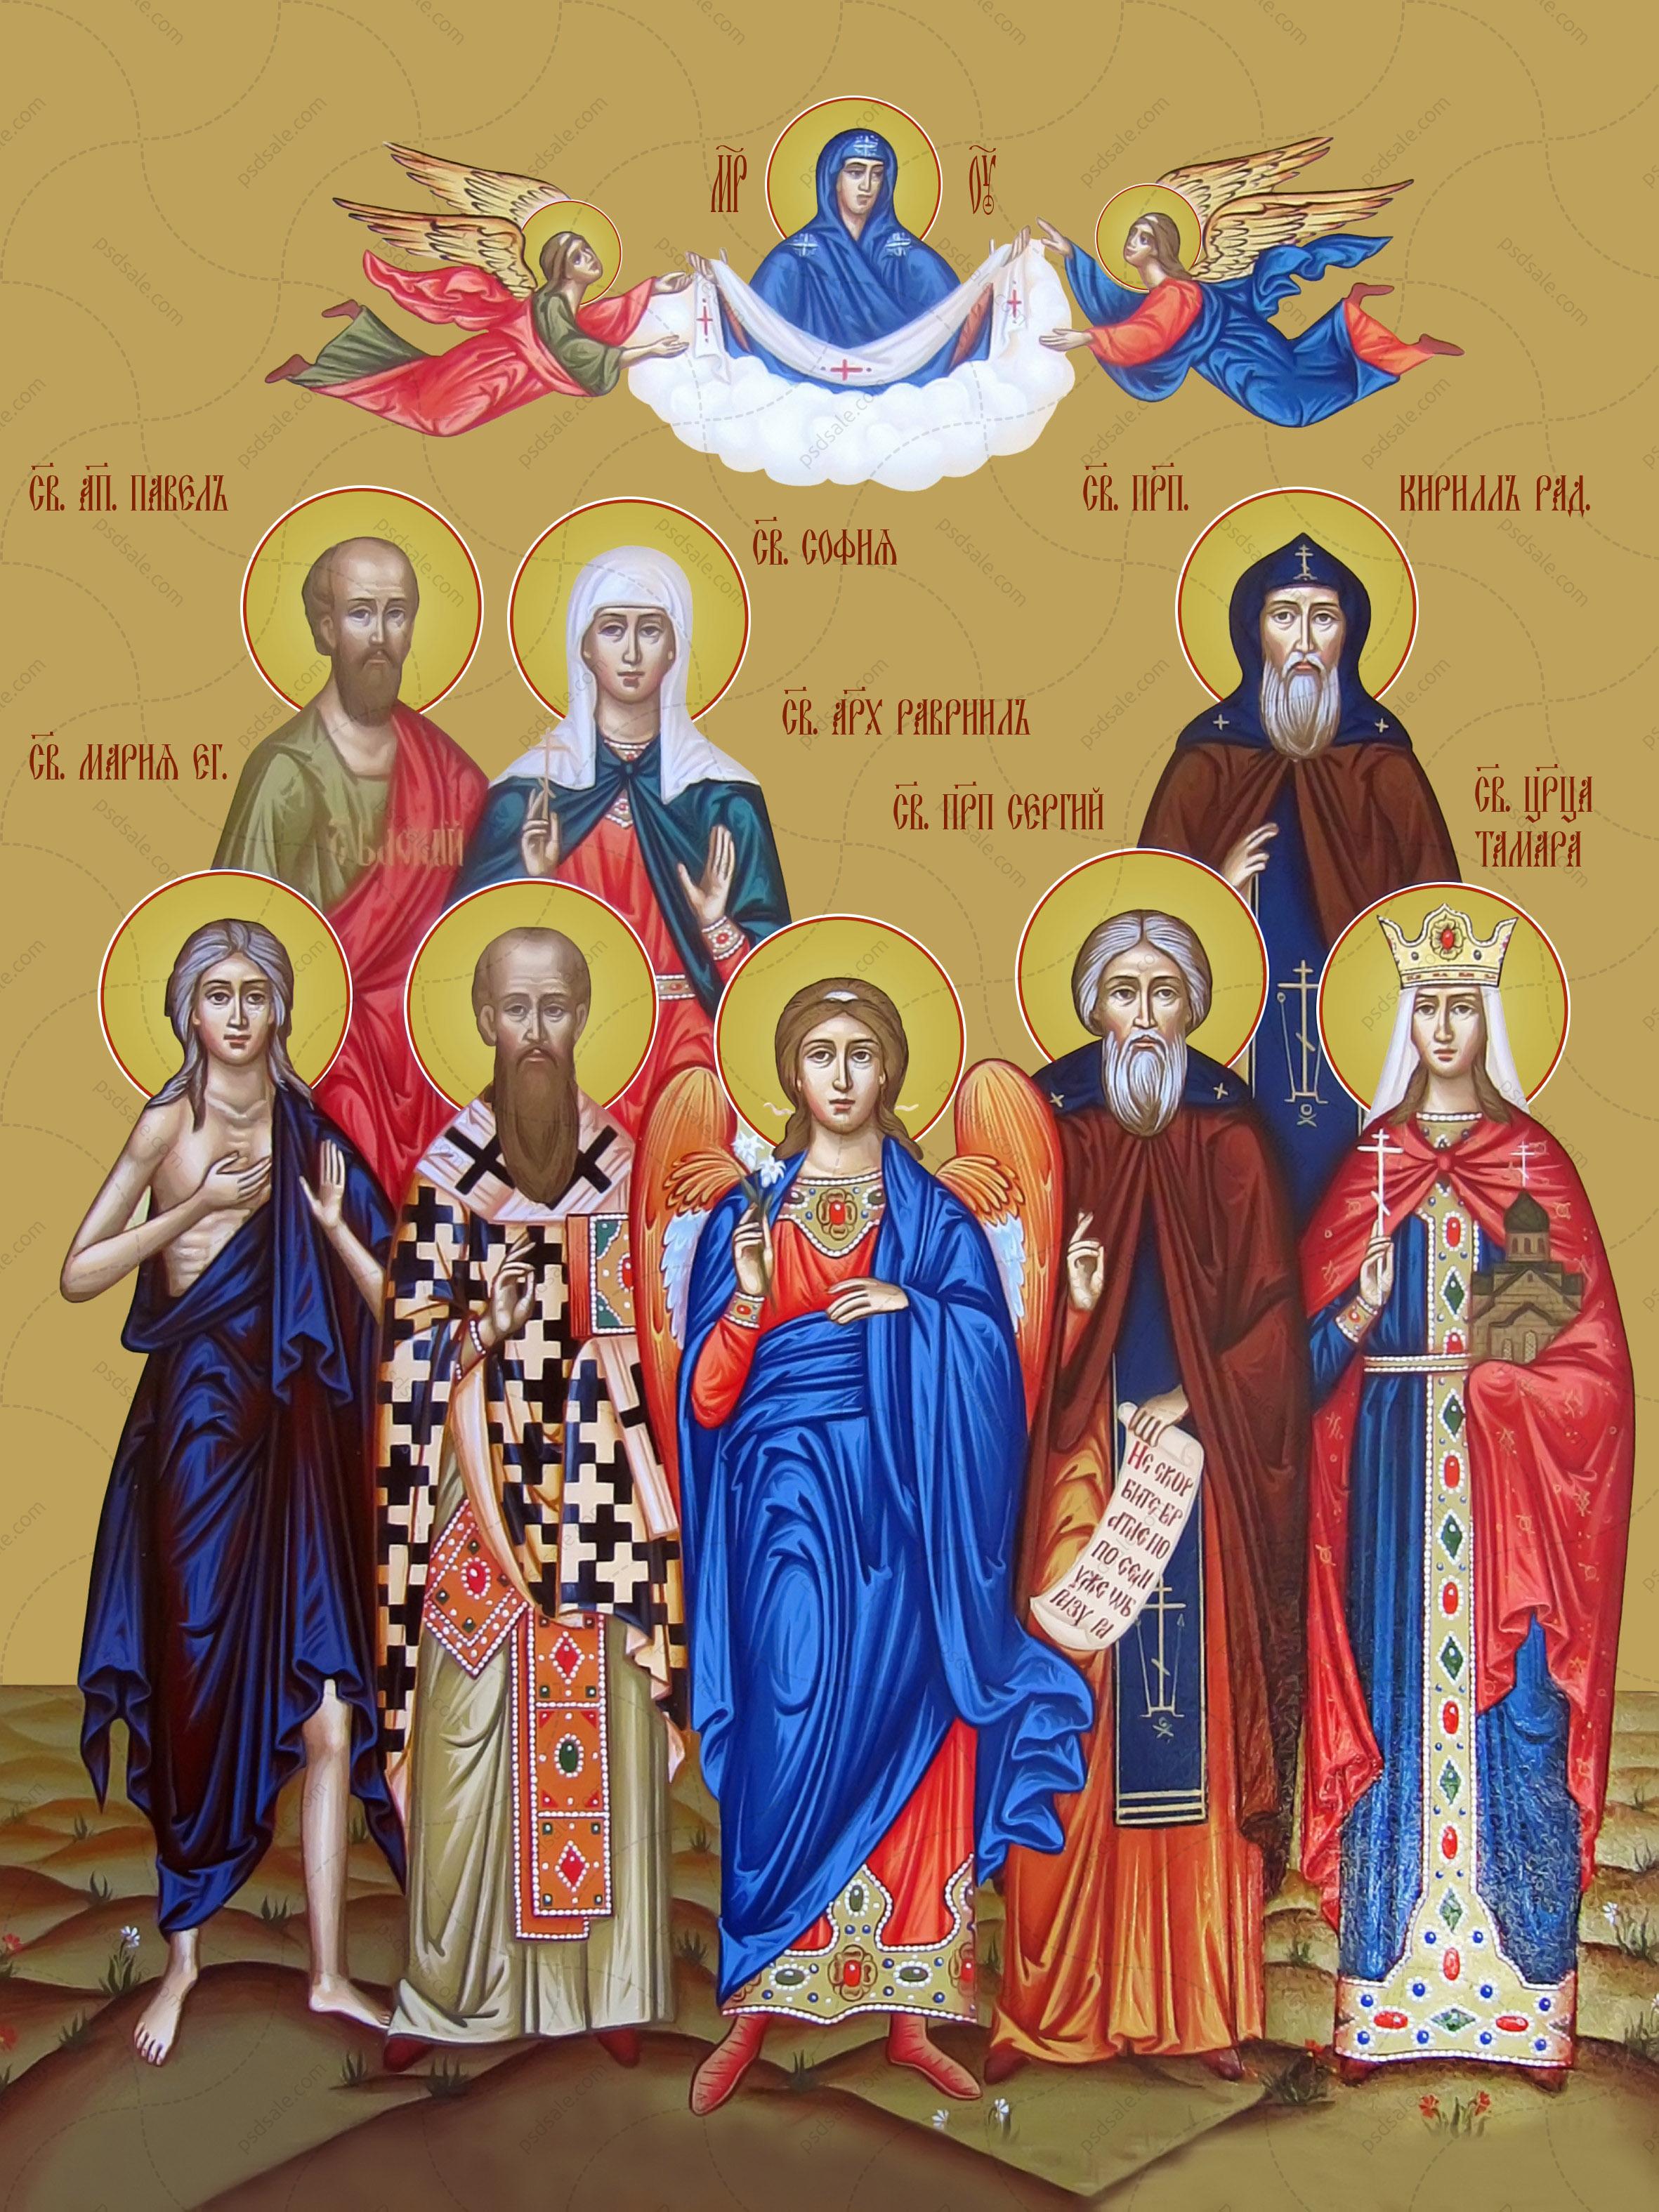 Мария, Василий, Павел, София, Сергий, Тамара, Кирилл